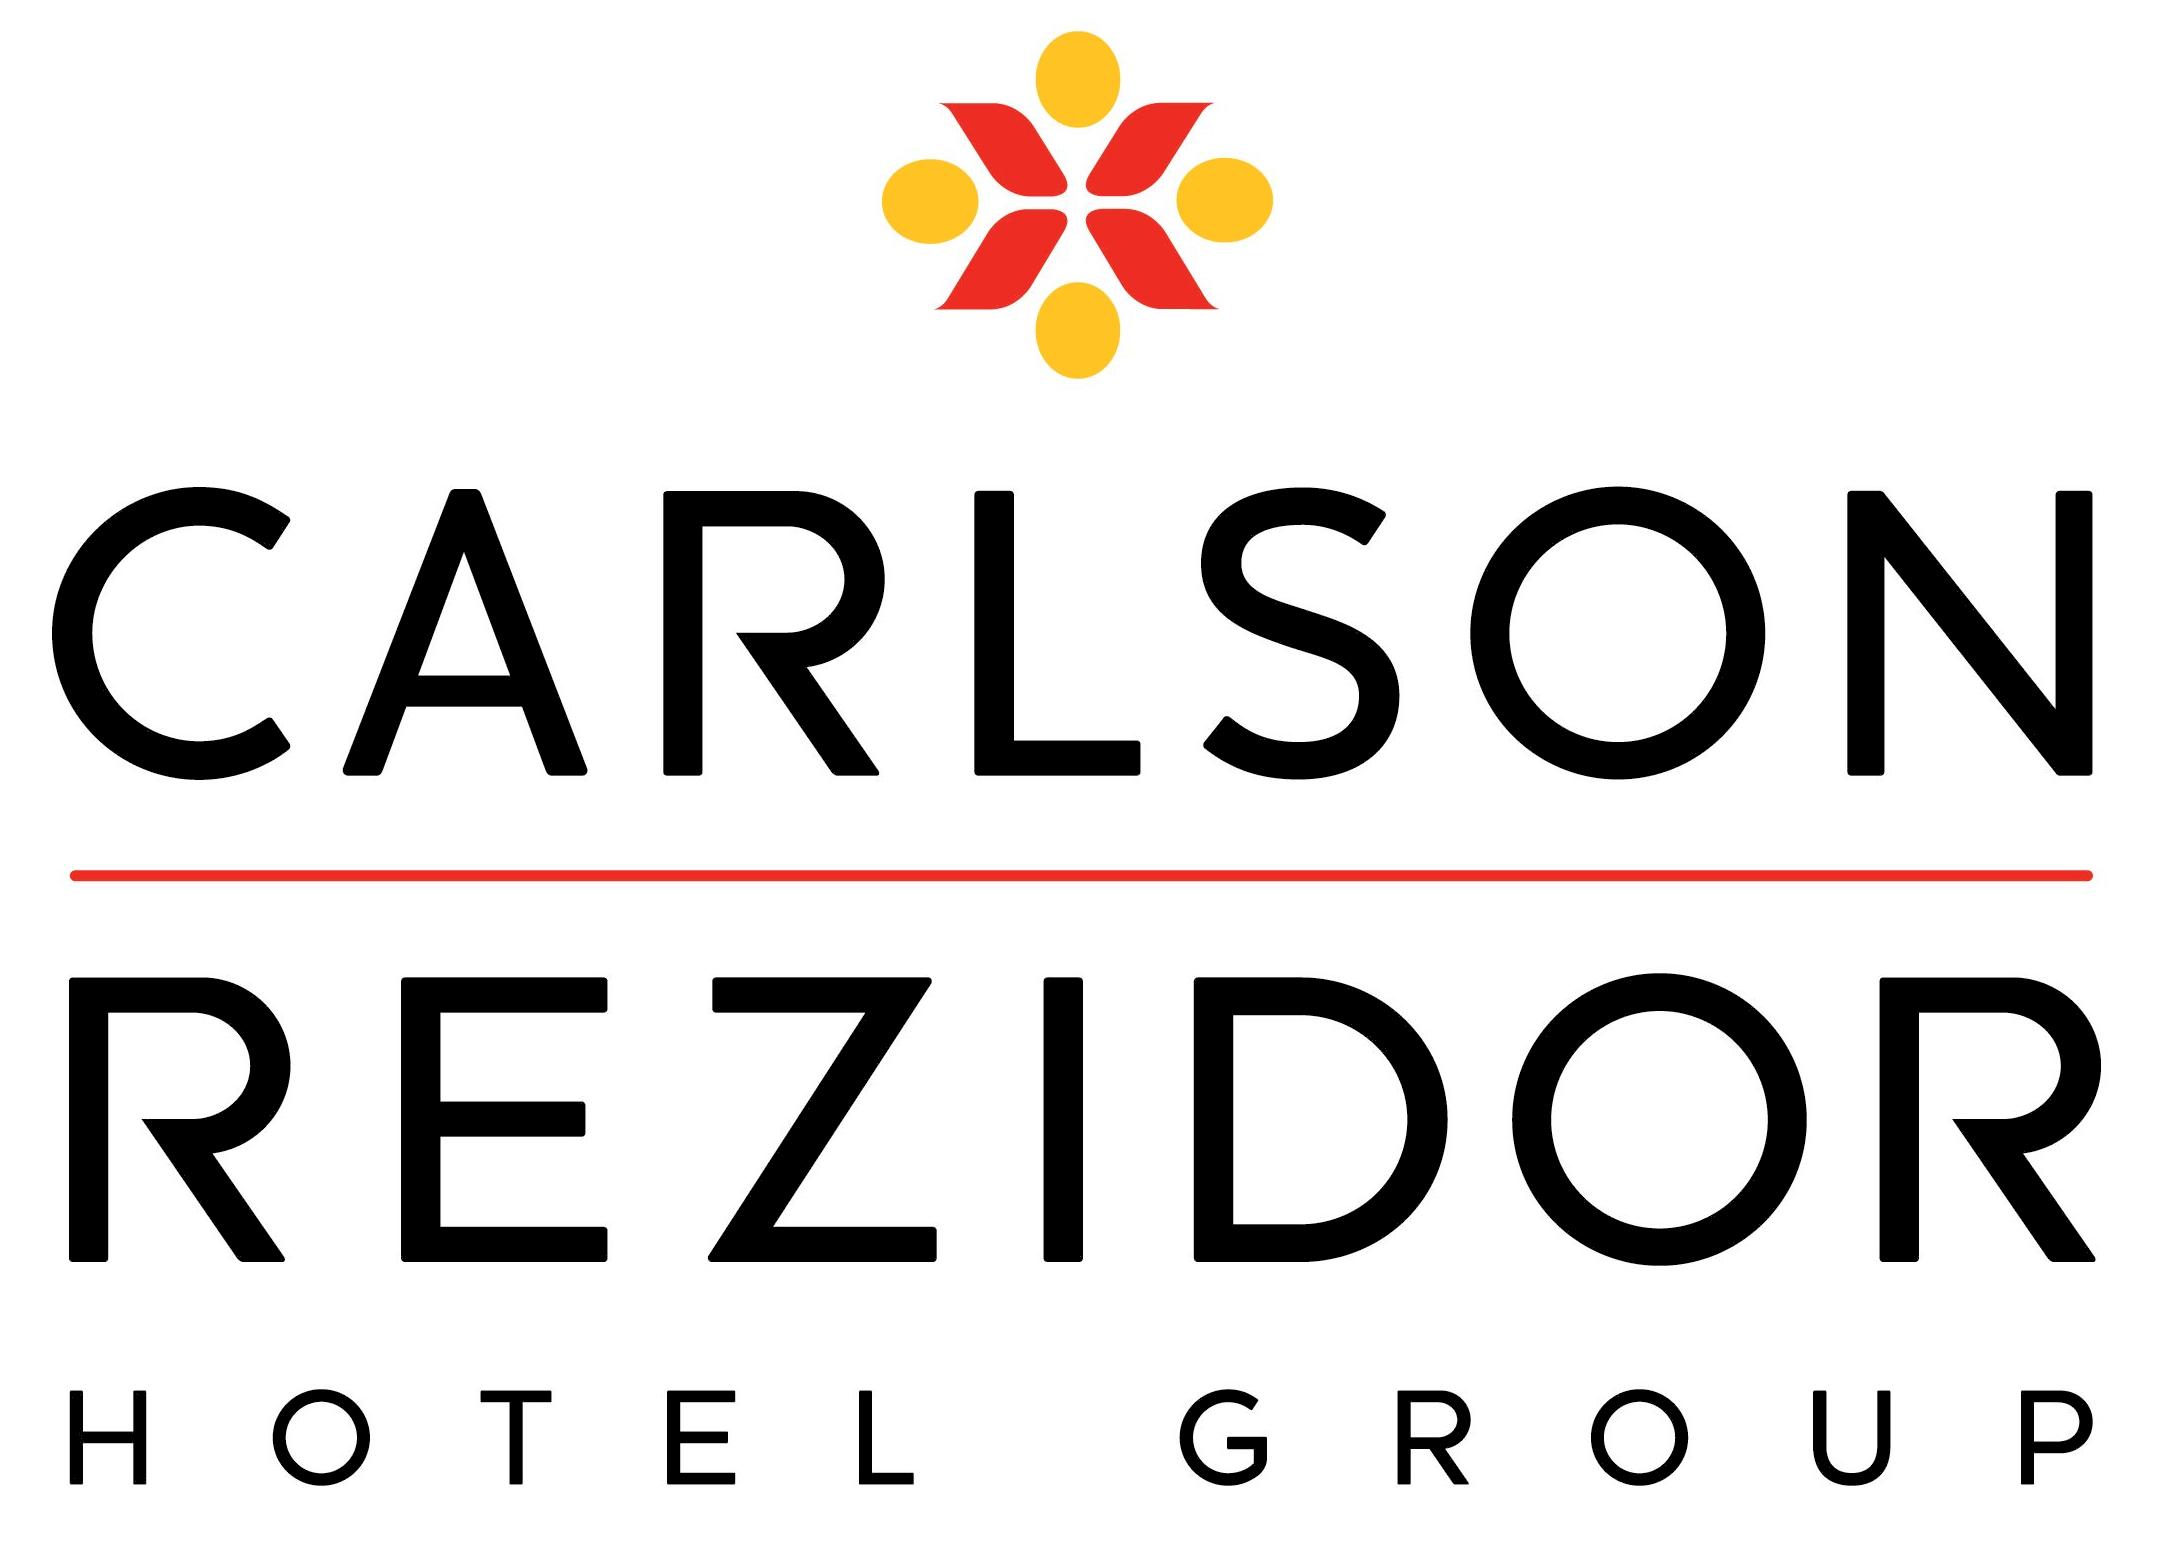 Carlson_Rezidor_Hotel_Group_logo_logotype.png